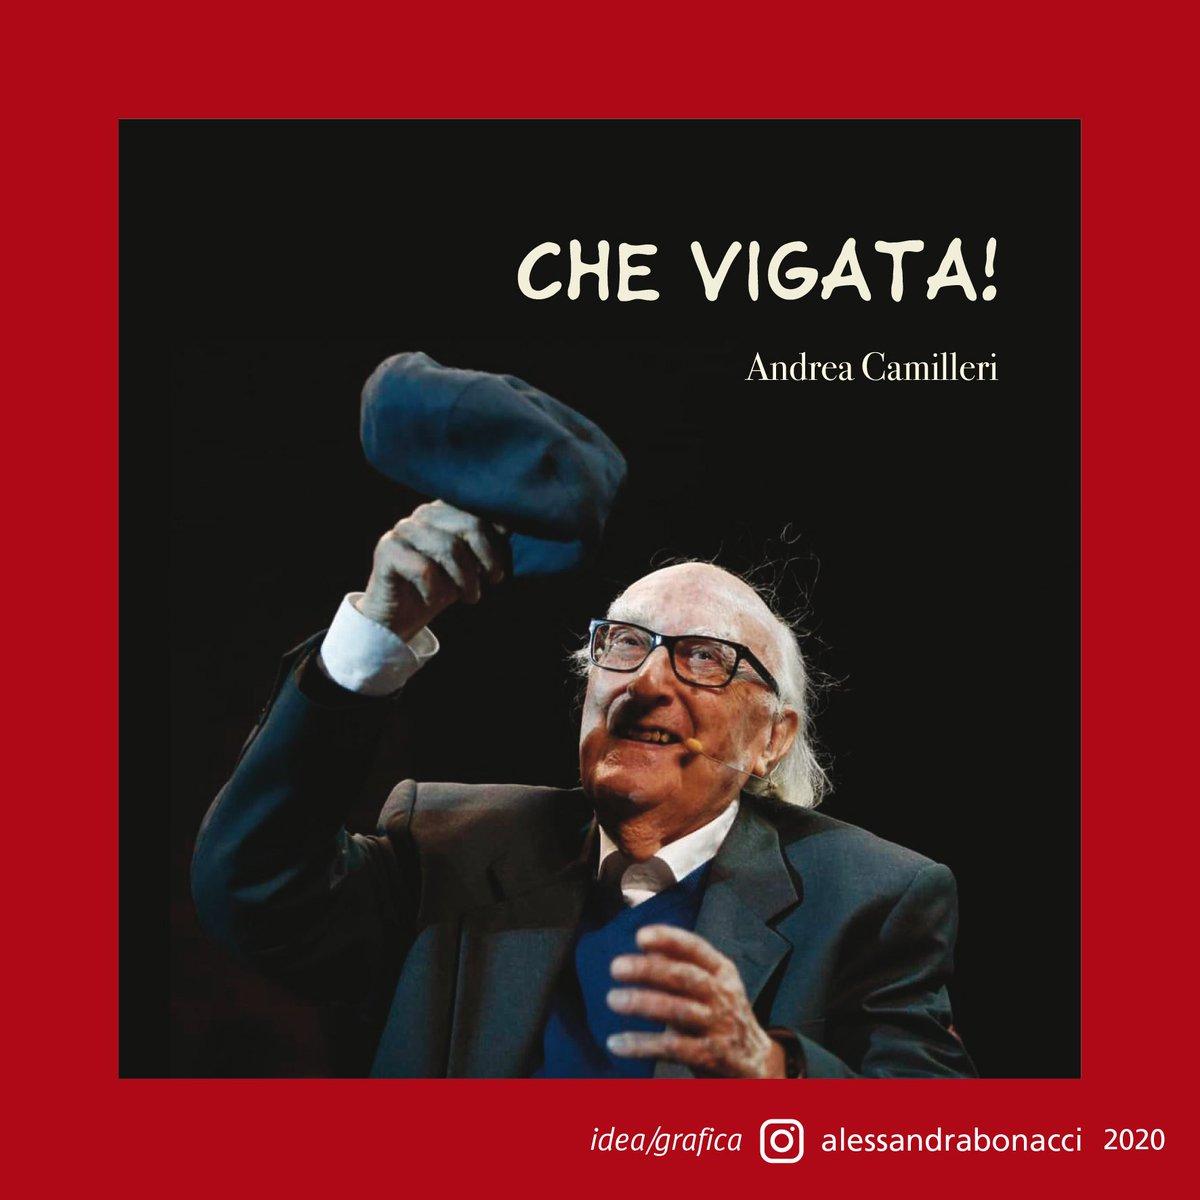 Idea/grafica: Che vigata! -- #andreacamilleri #ilcommissariomontalbano #vigata #sellerio #sellerioeditore #lucazingaretti https://t.co/EGsZKqmdK8